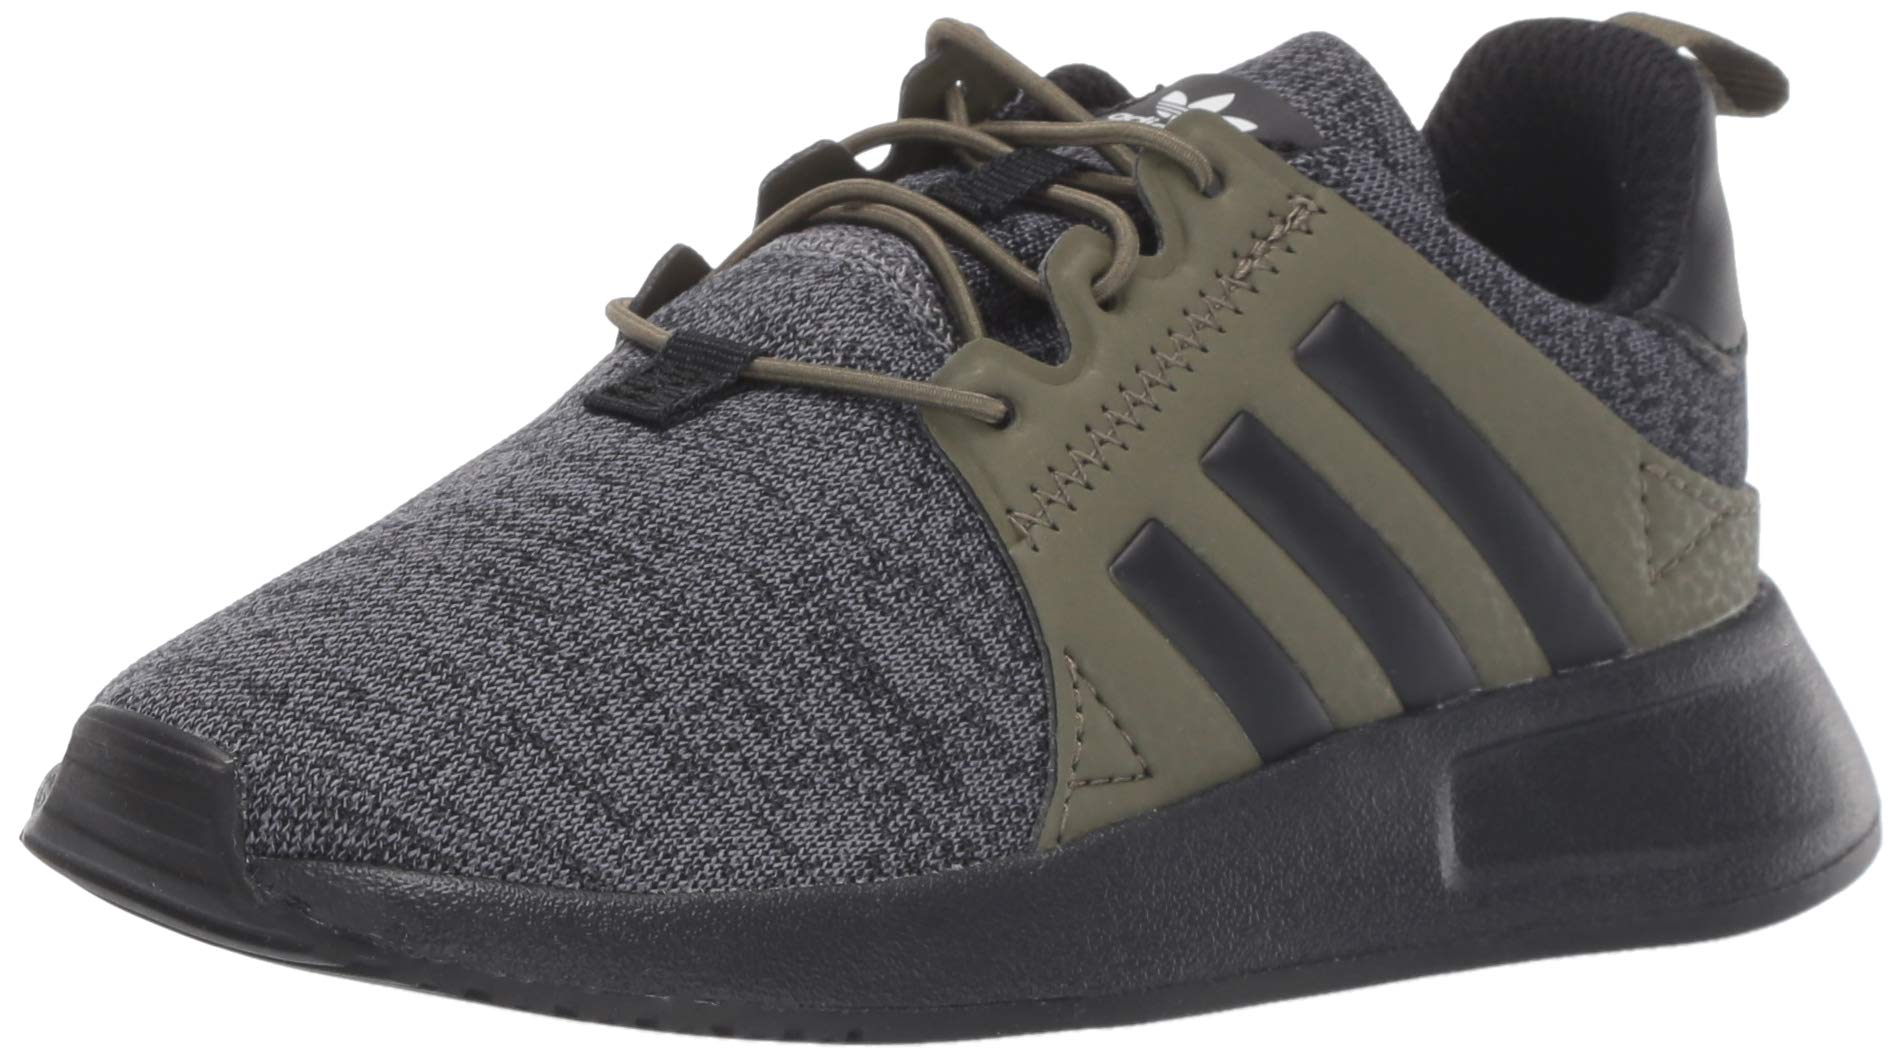 adidas Originals Baby X_PLR Running Shoe Dark Grey Heather/Black/raw Khaki 5K M US Toddler